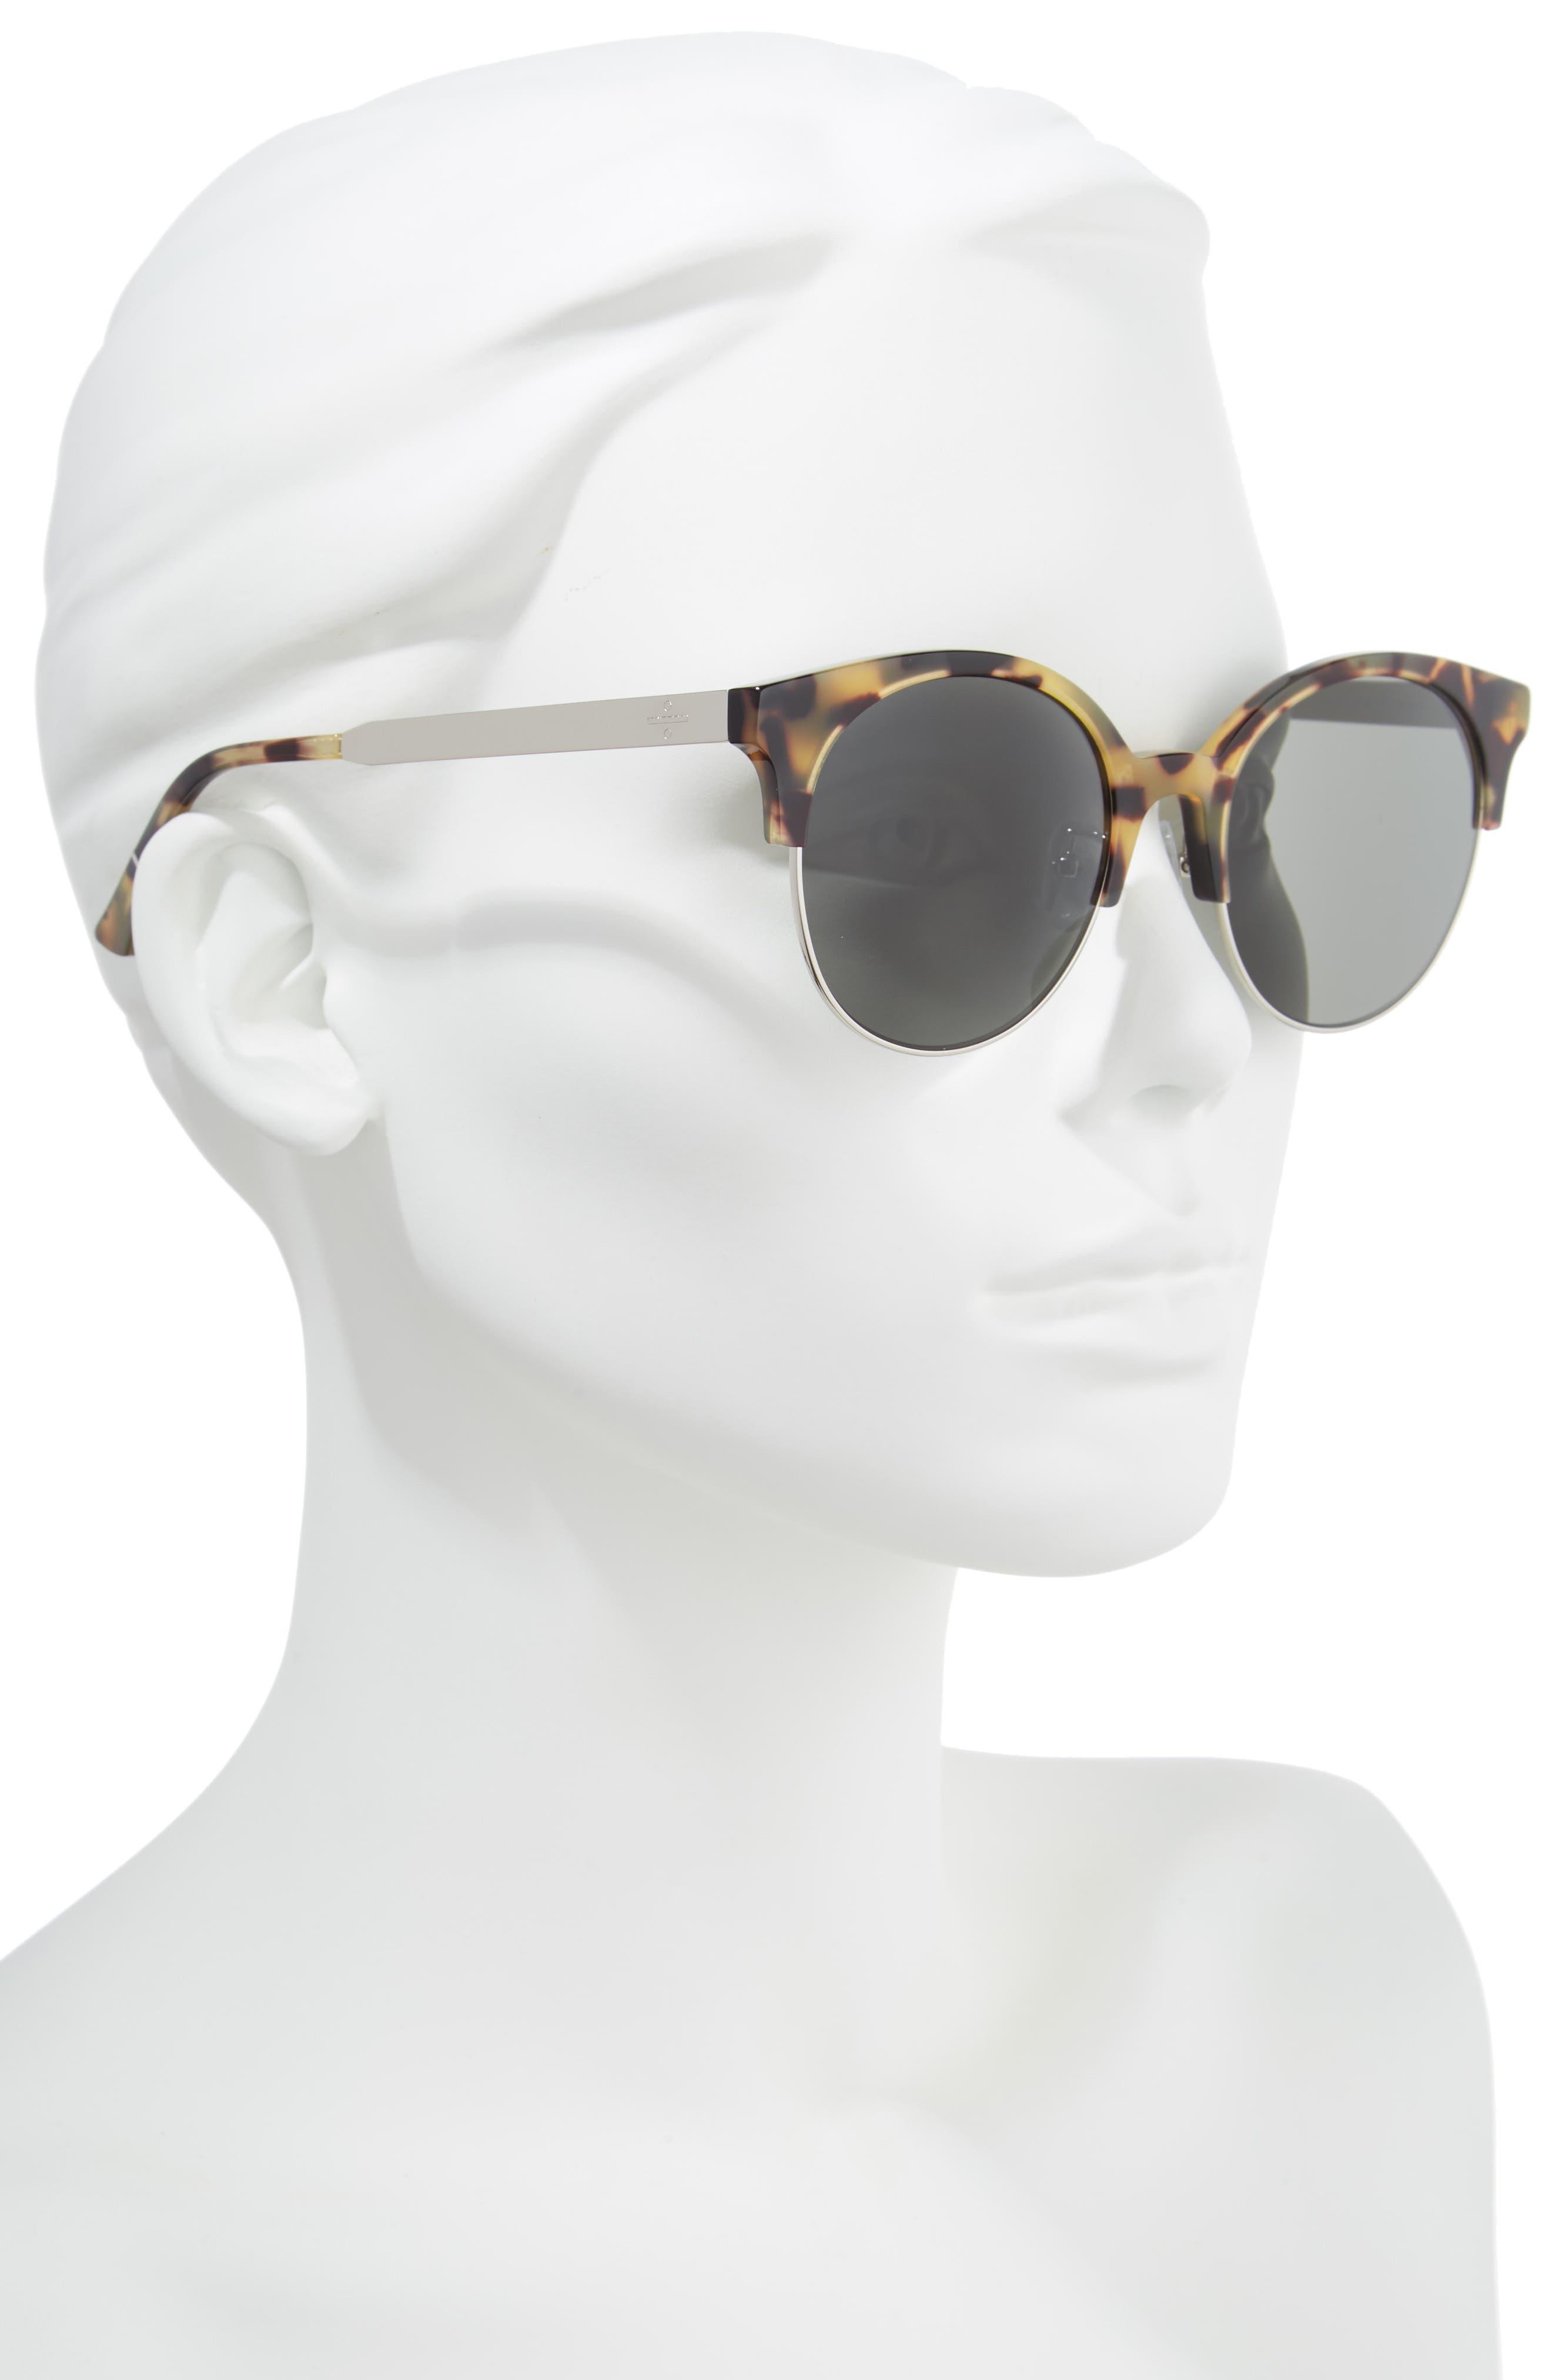 BLANC & ECLARE Venice Round Sunglasses,                             Alternate thumbnail 2, color,                             Tortoise/ Grey